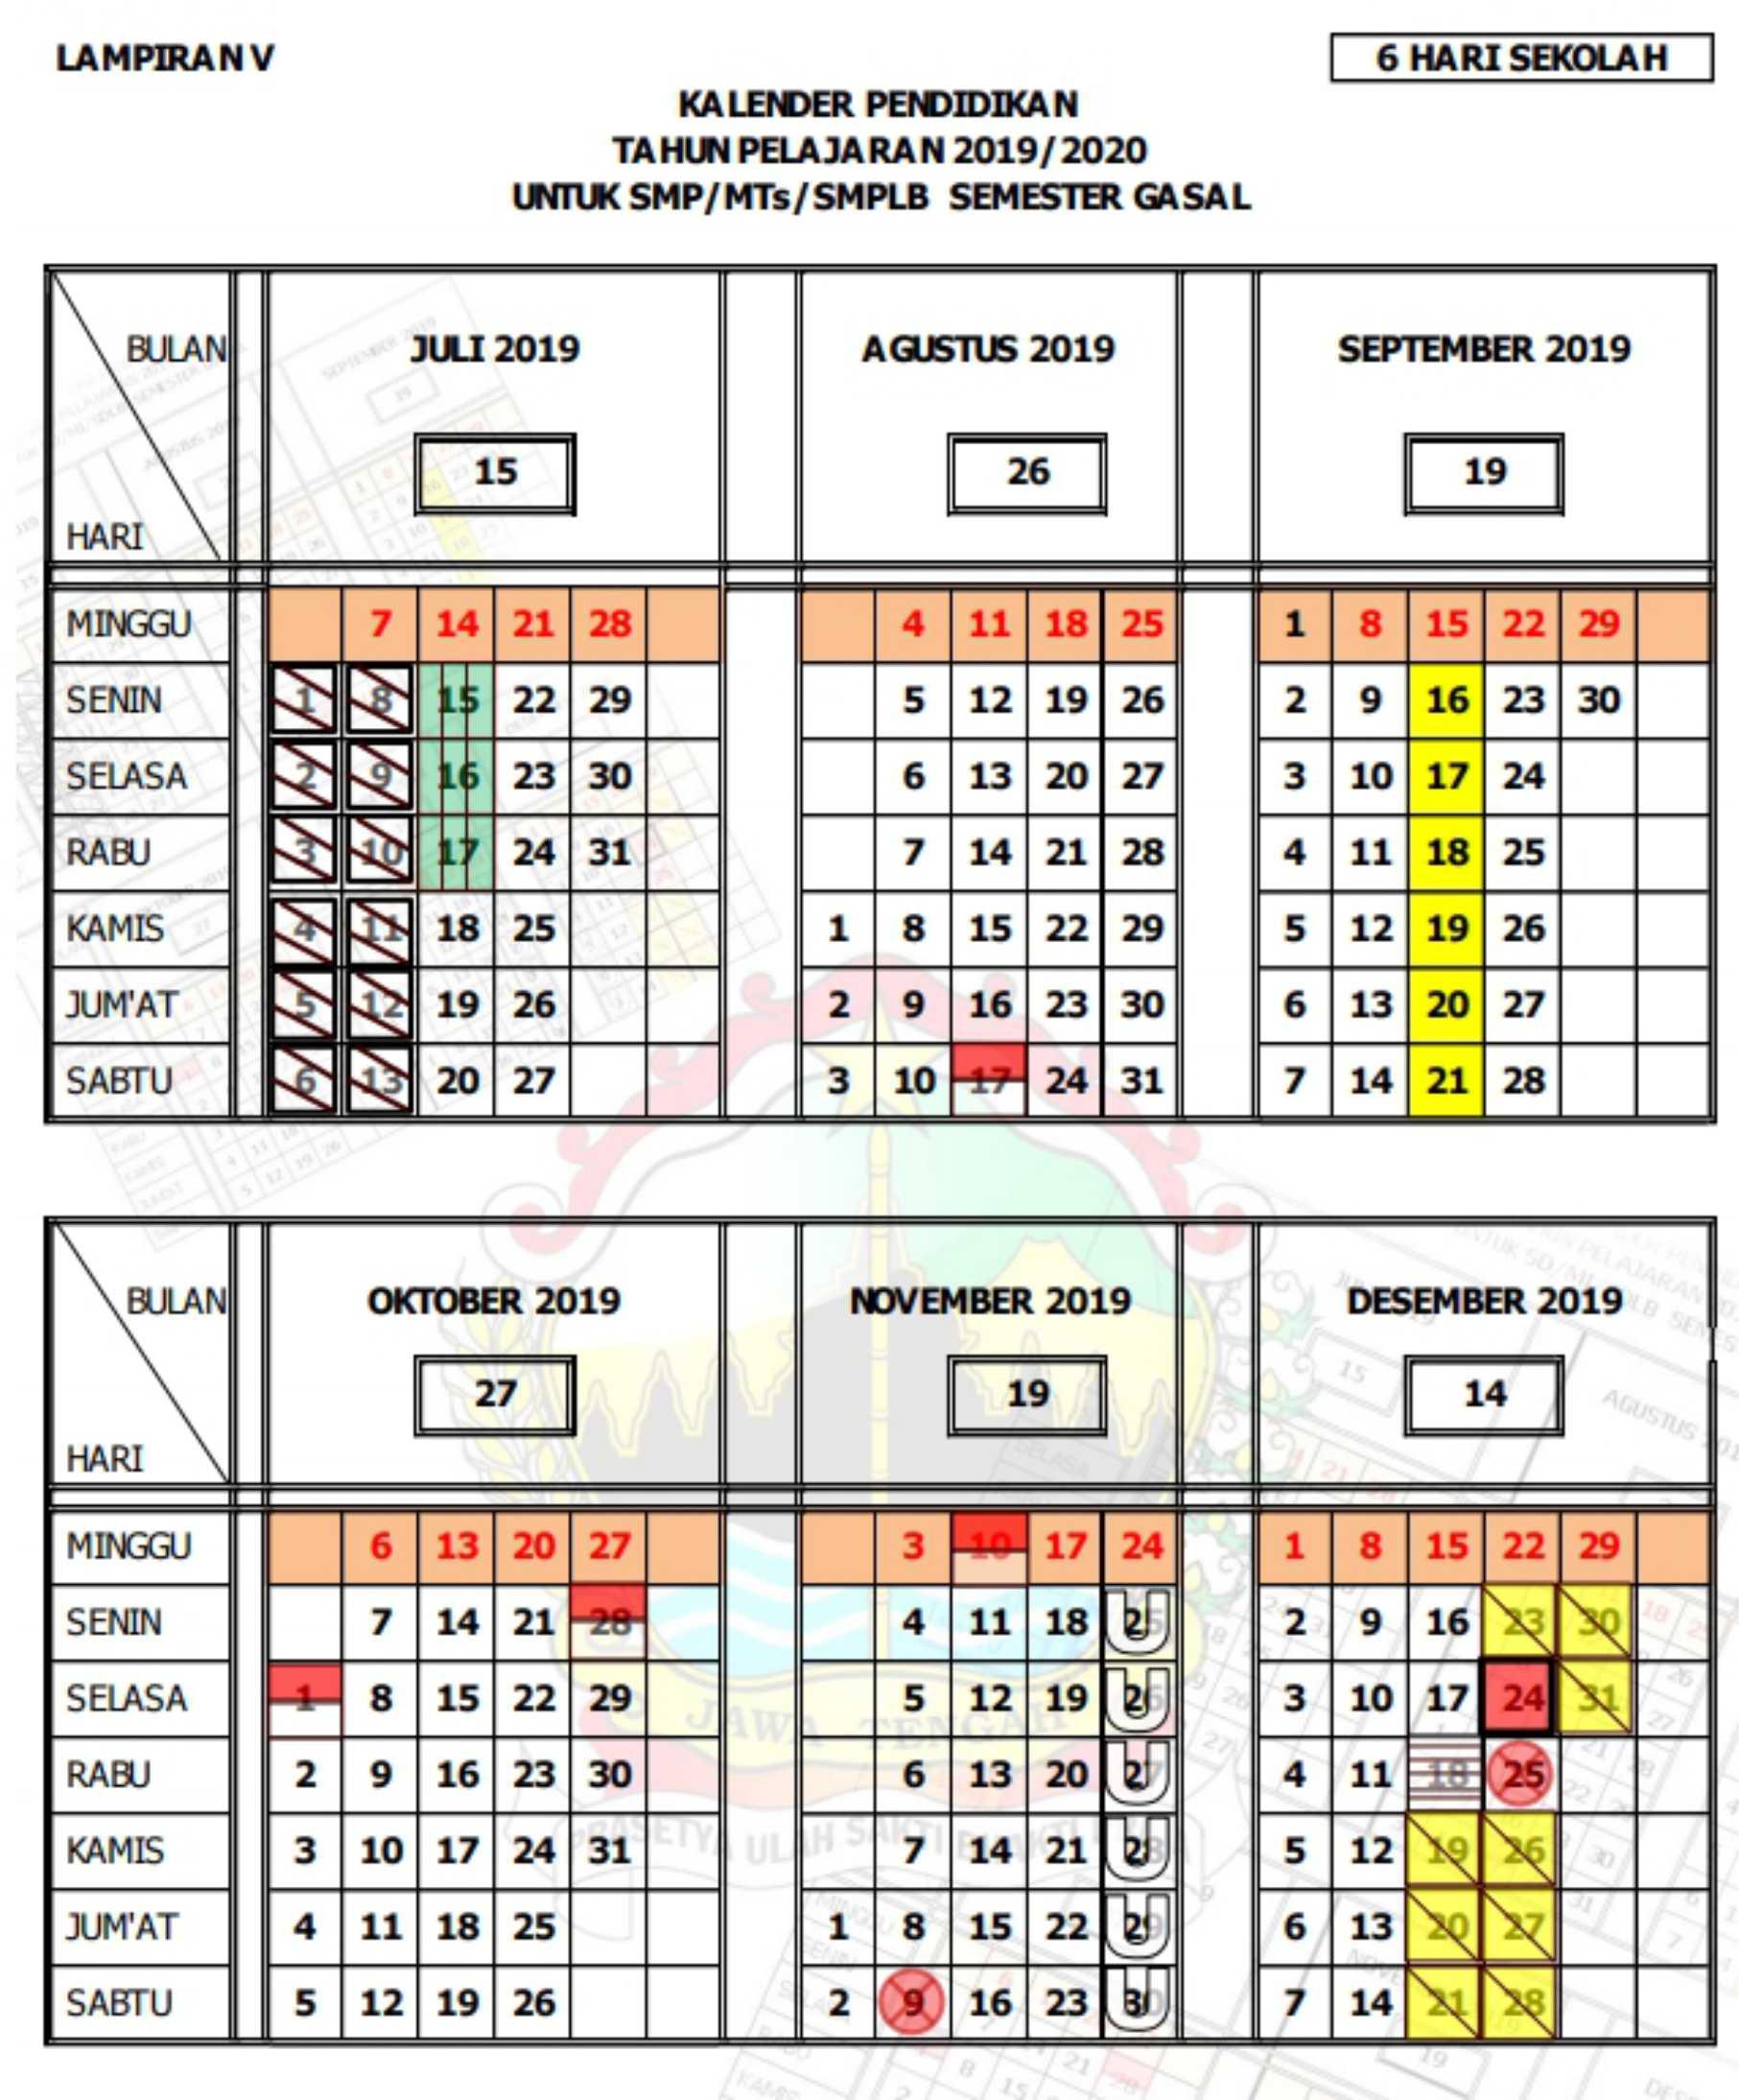 kalender pendidikan tahun pelajaran 2019 - 2020 semester gasal (ganjil) SMP SMPLB MTs (6 hari sekolah) provinsi jawa tengah